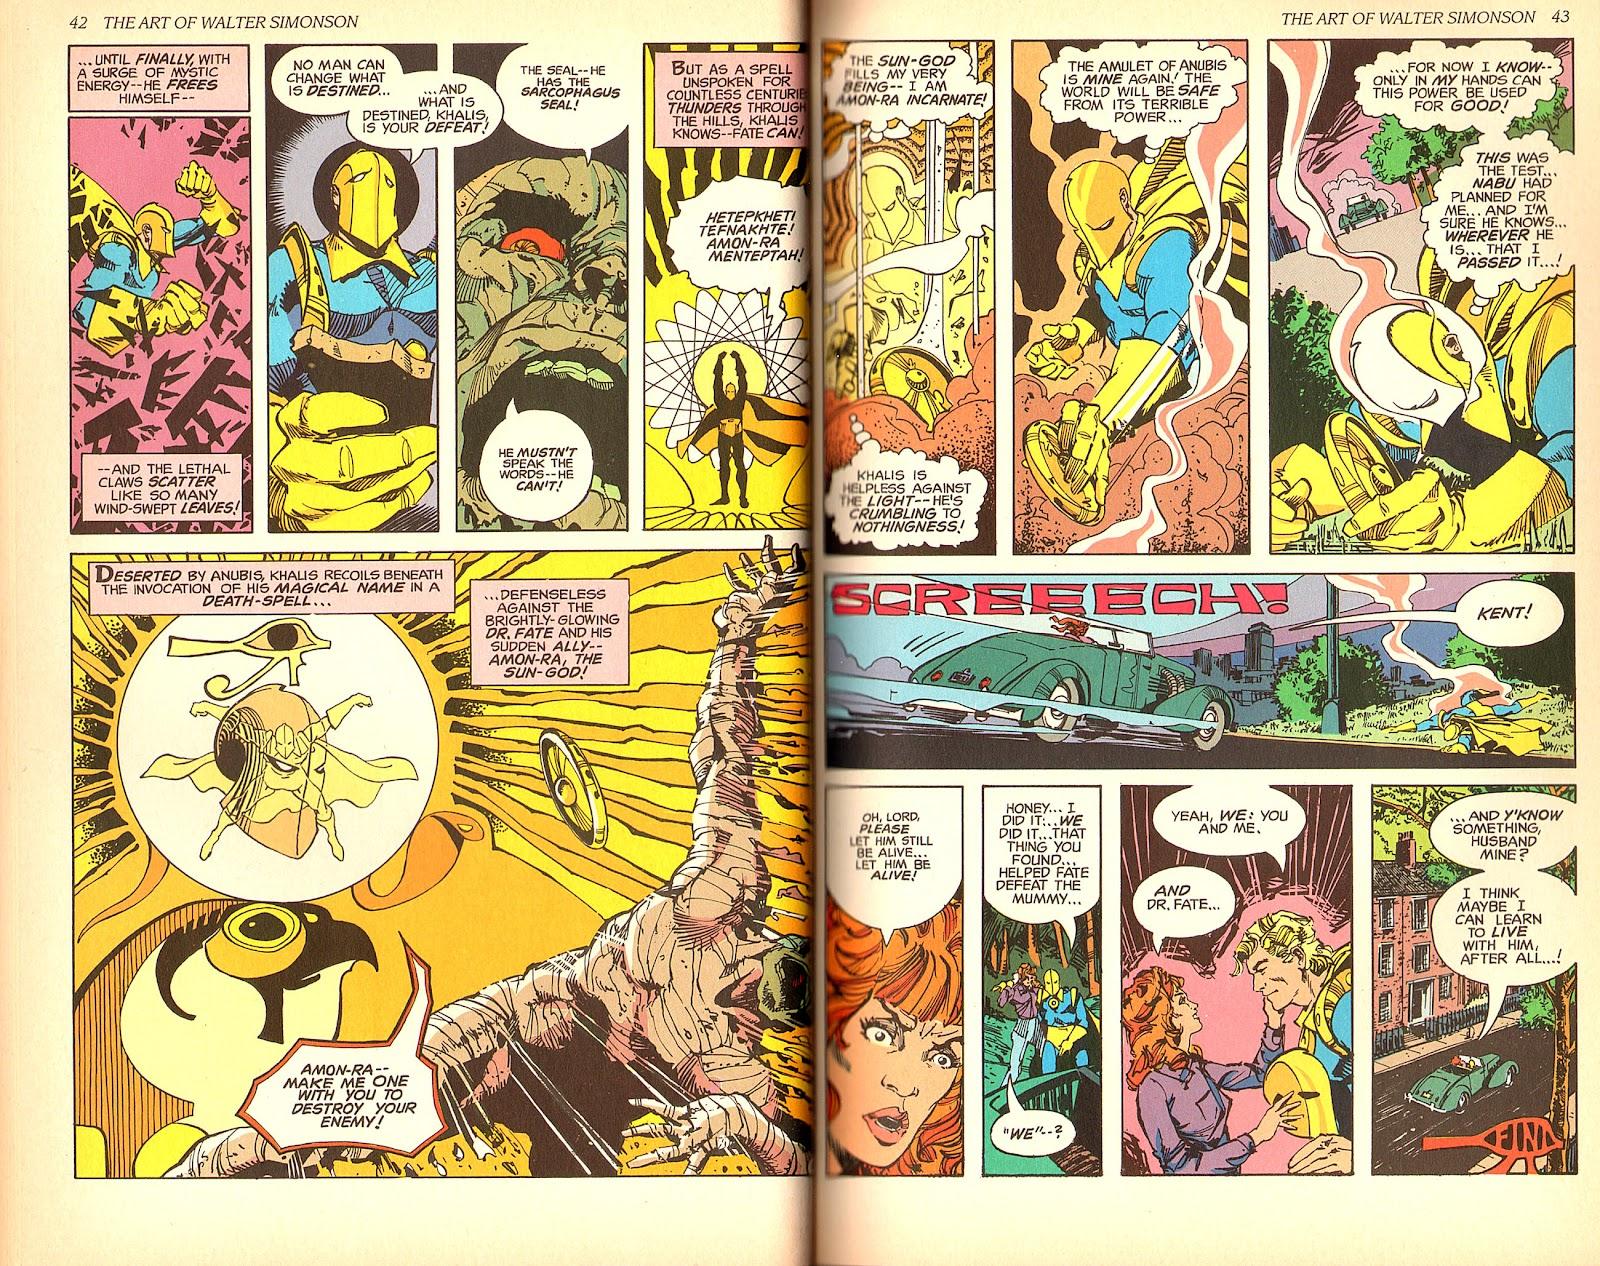 Read online The Art of Walter Simonson comic -  Issue # TPB - 23